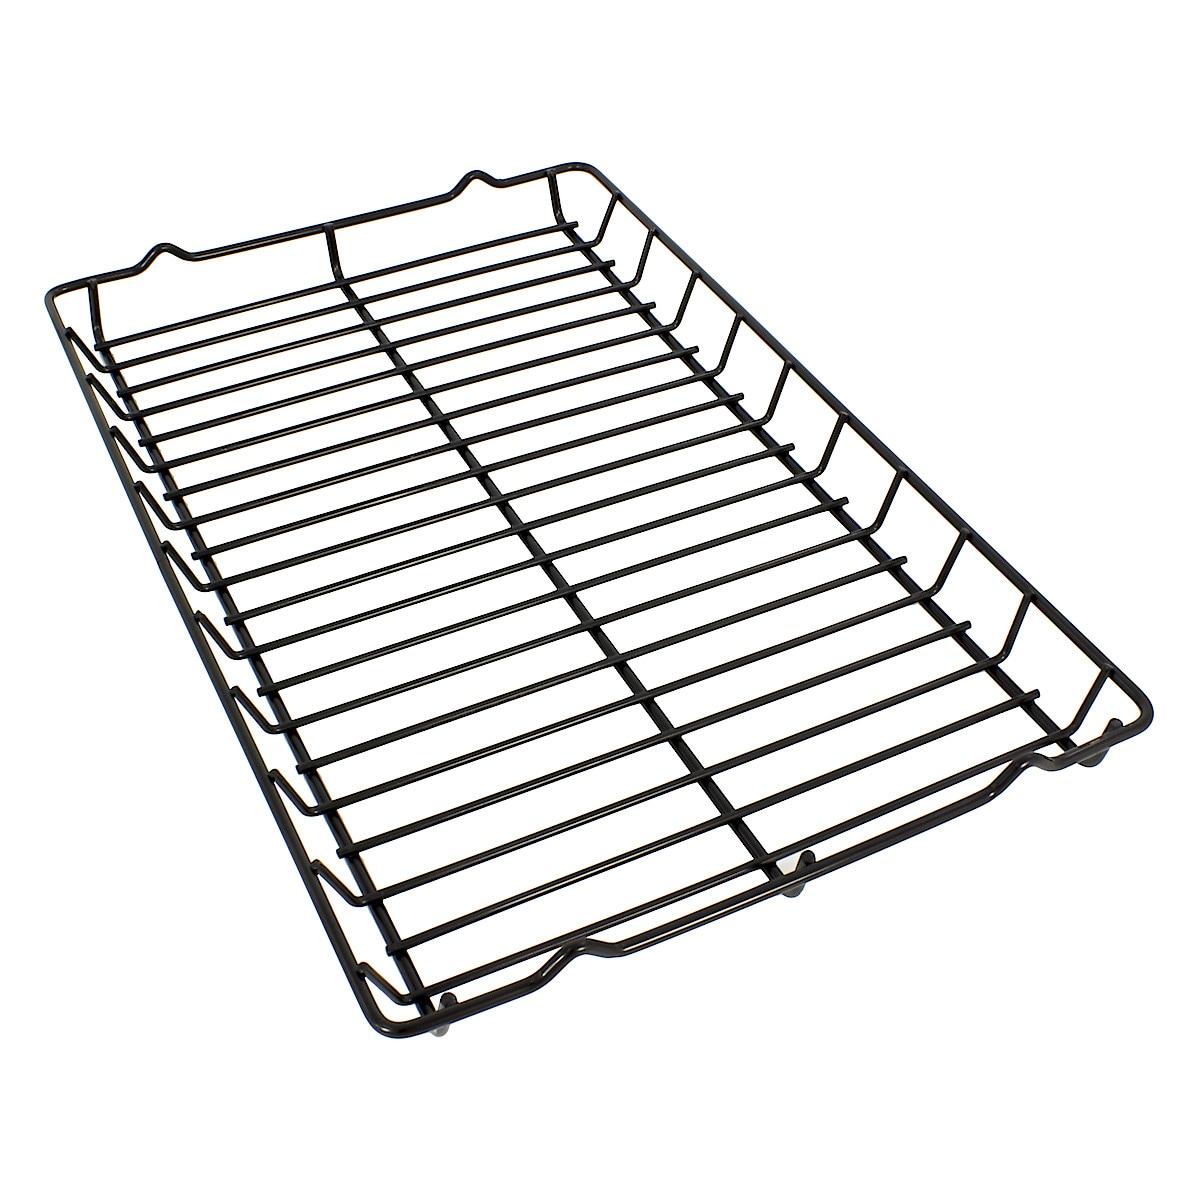 Charcoal racket 452 x 284 x 34 mm